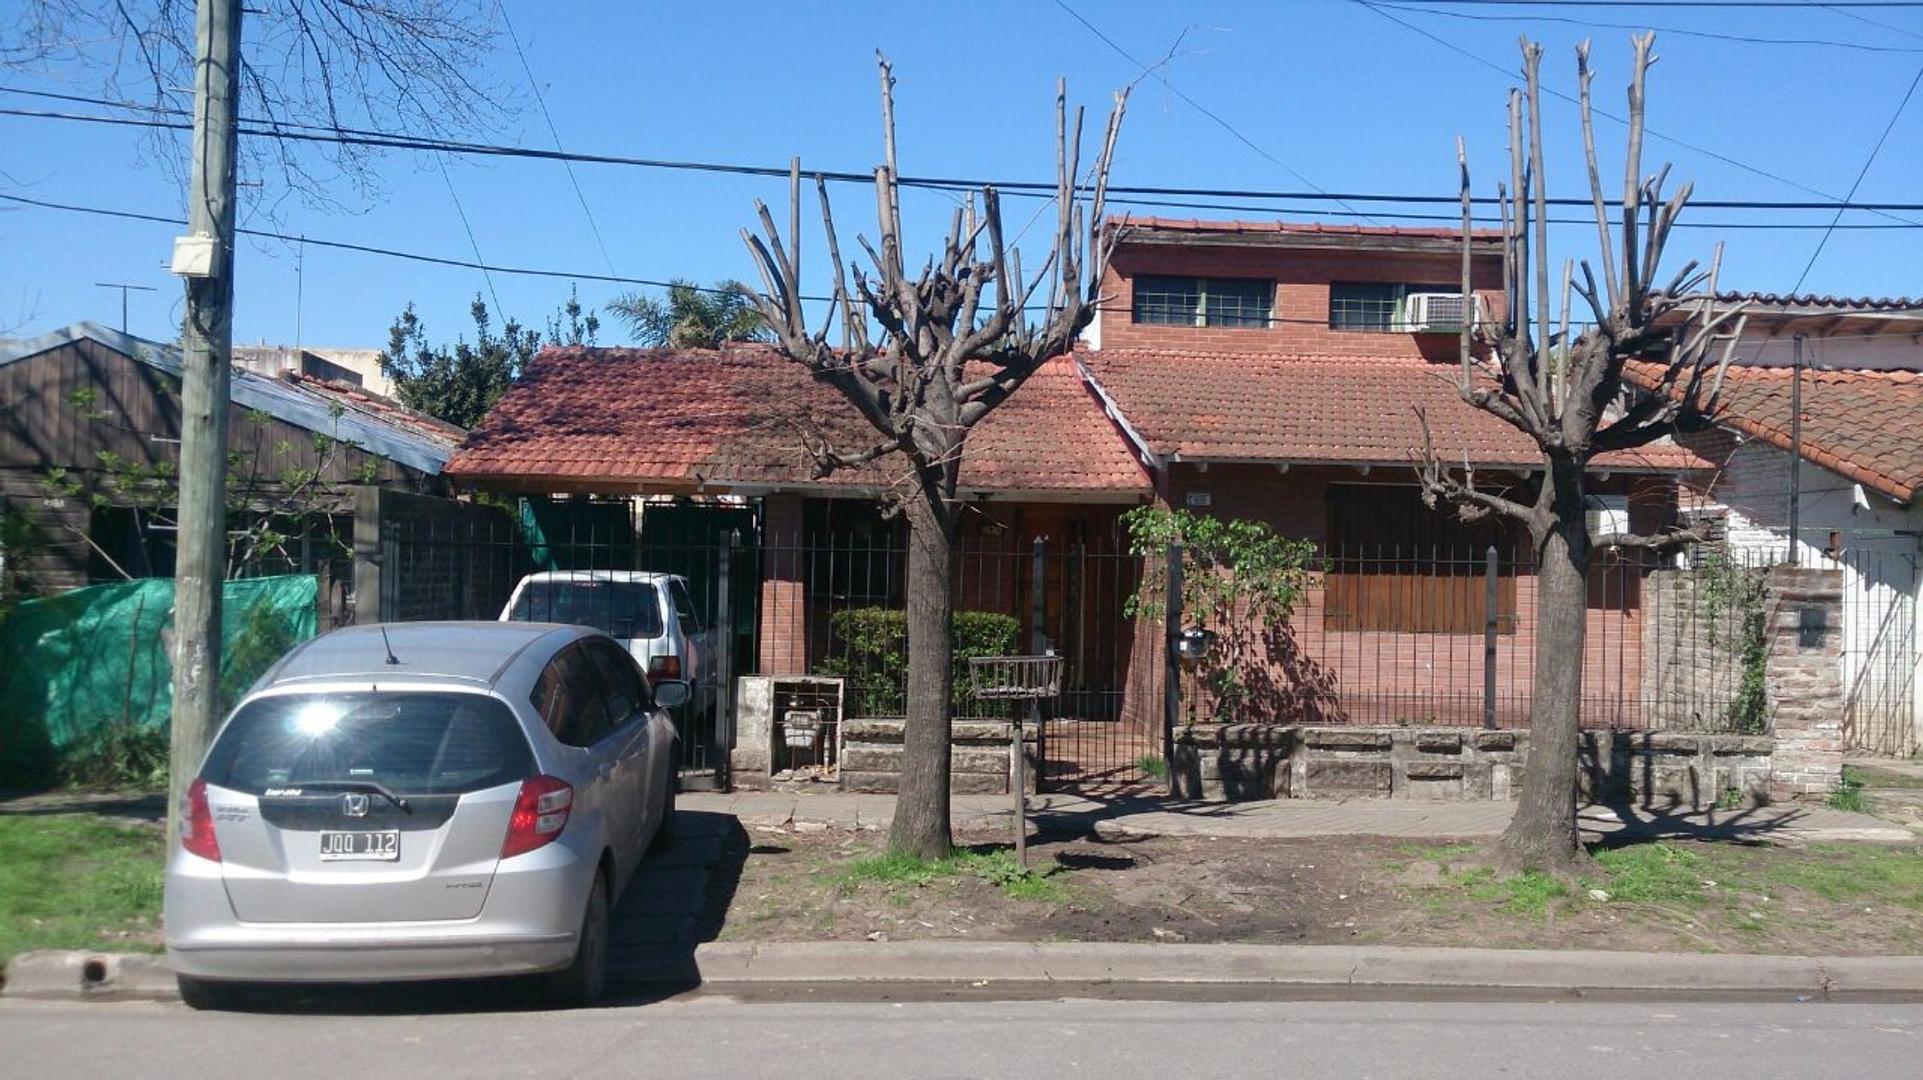 Casa - Venta - Argentina, Ituzaingó - Carabobo  1830